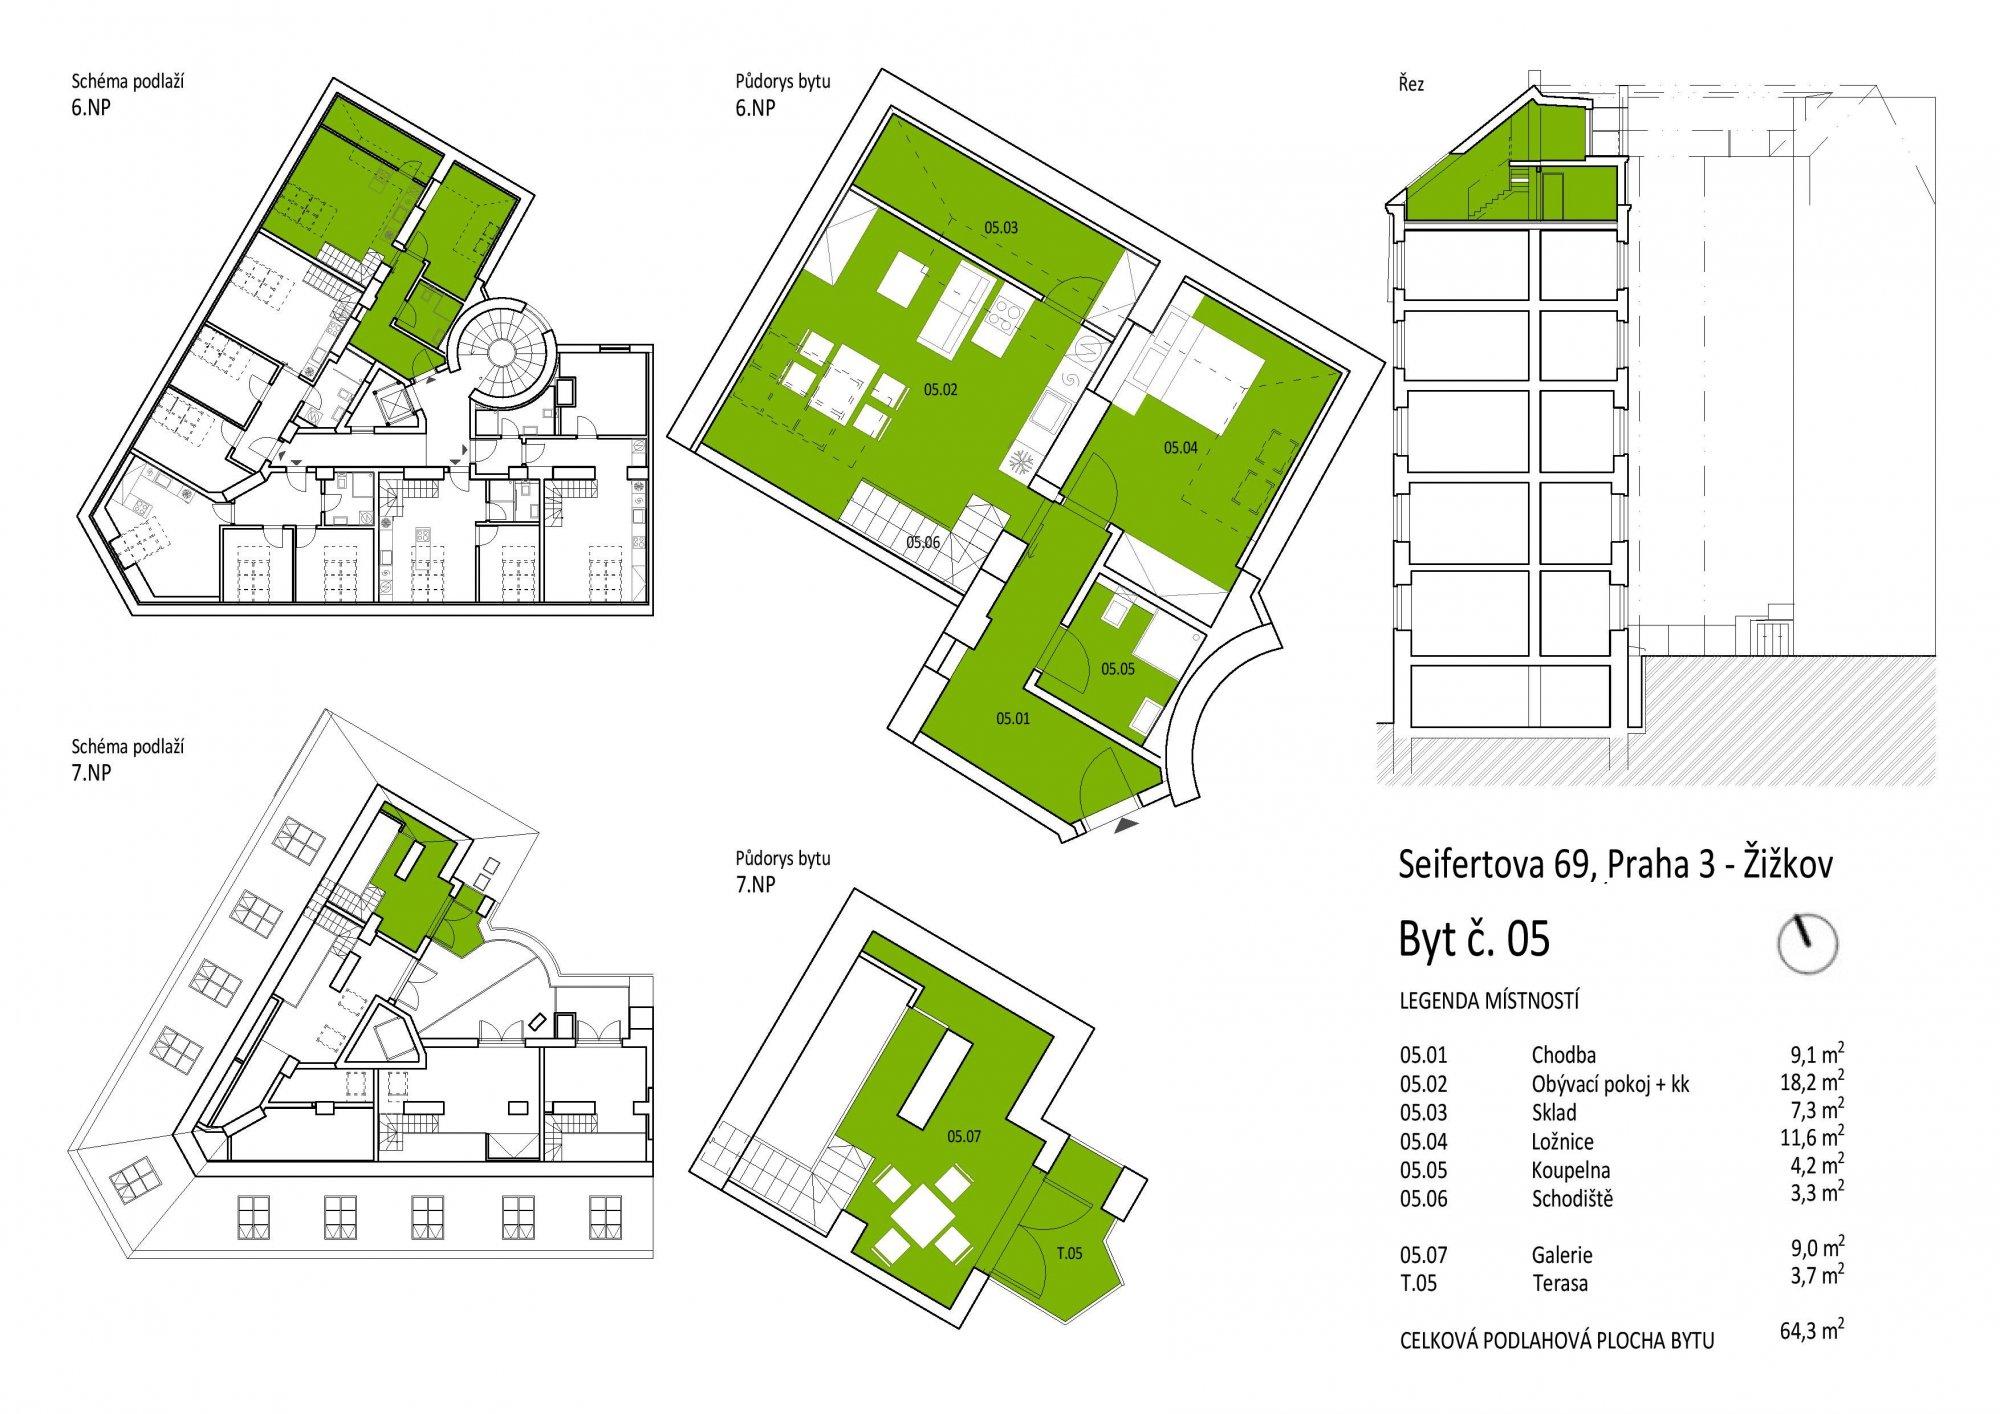 Půdorys - Půdní byt 2+kk, plocha 68 m², ulice Seifertova, Praha 3 - Žižkov